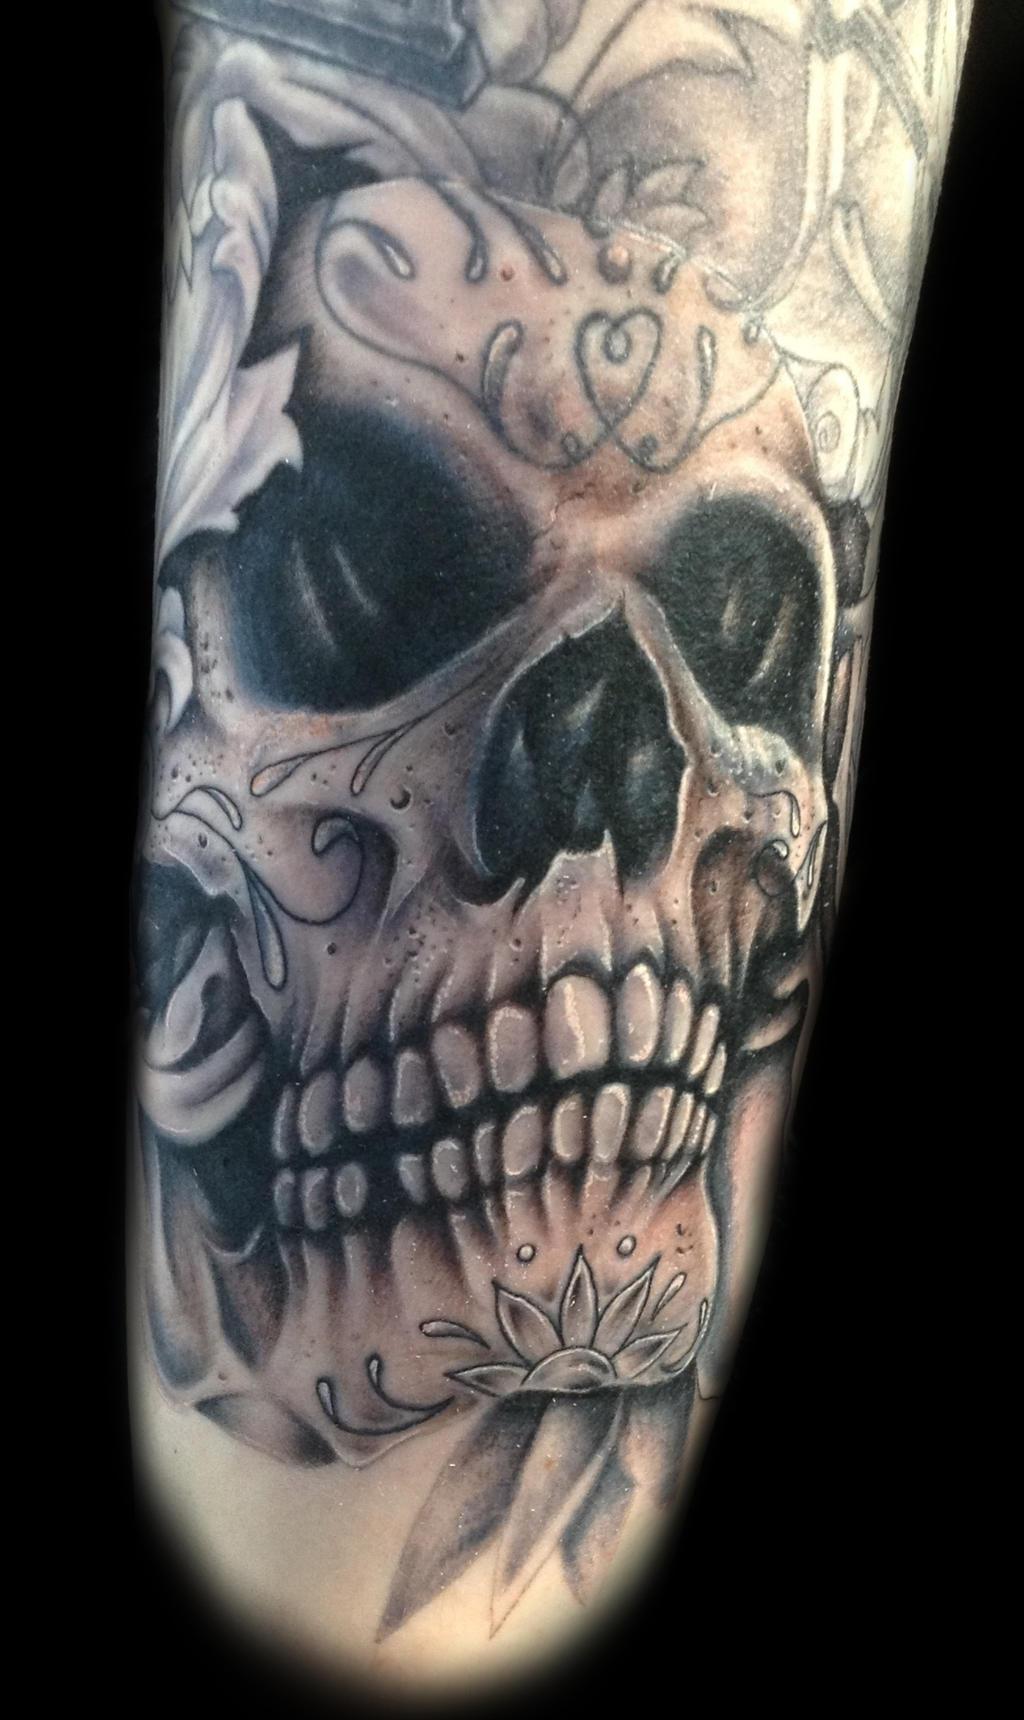 Triple H King Of Kings Skull Tattoo